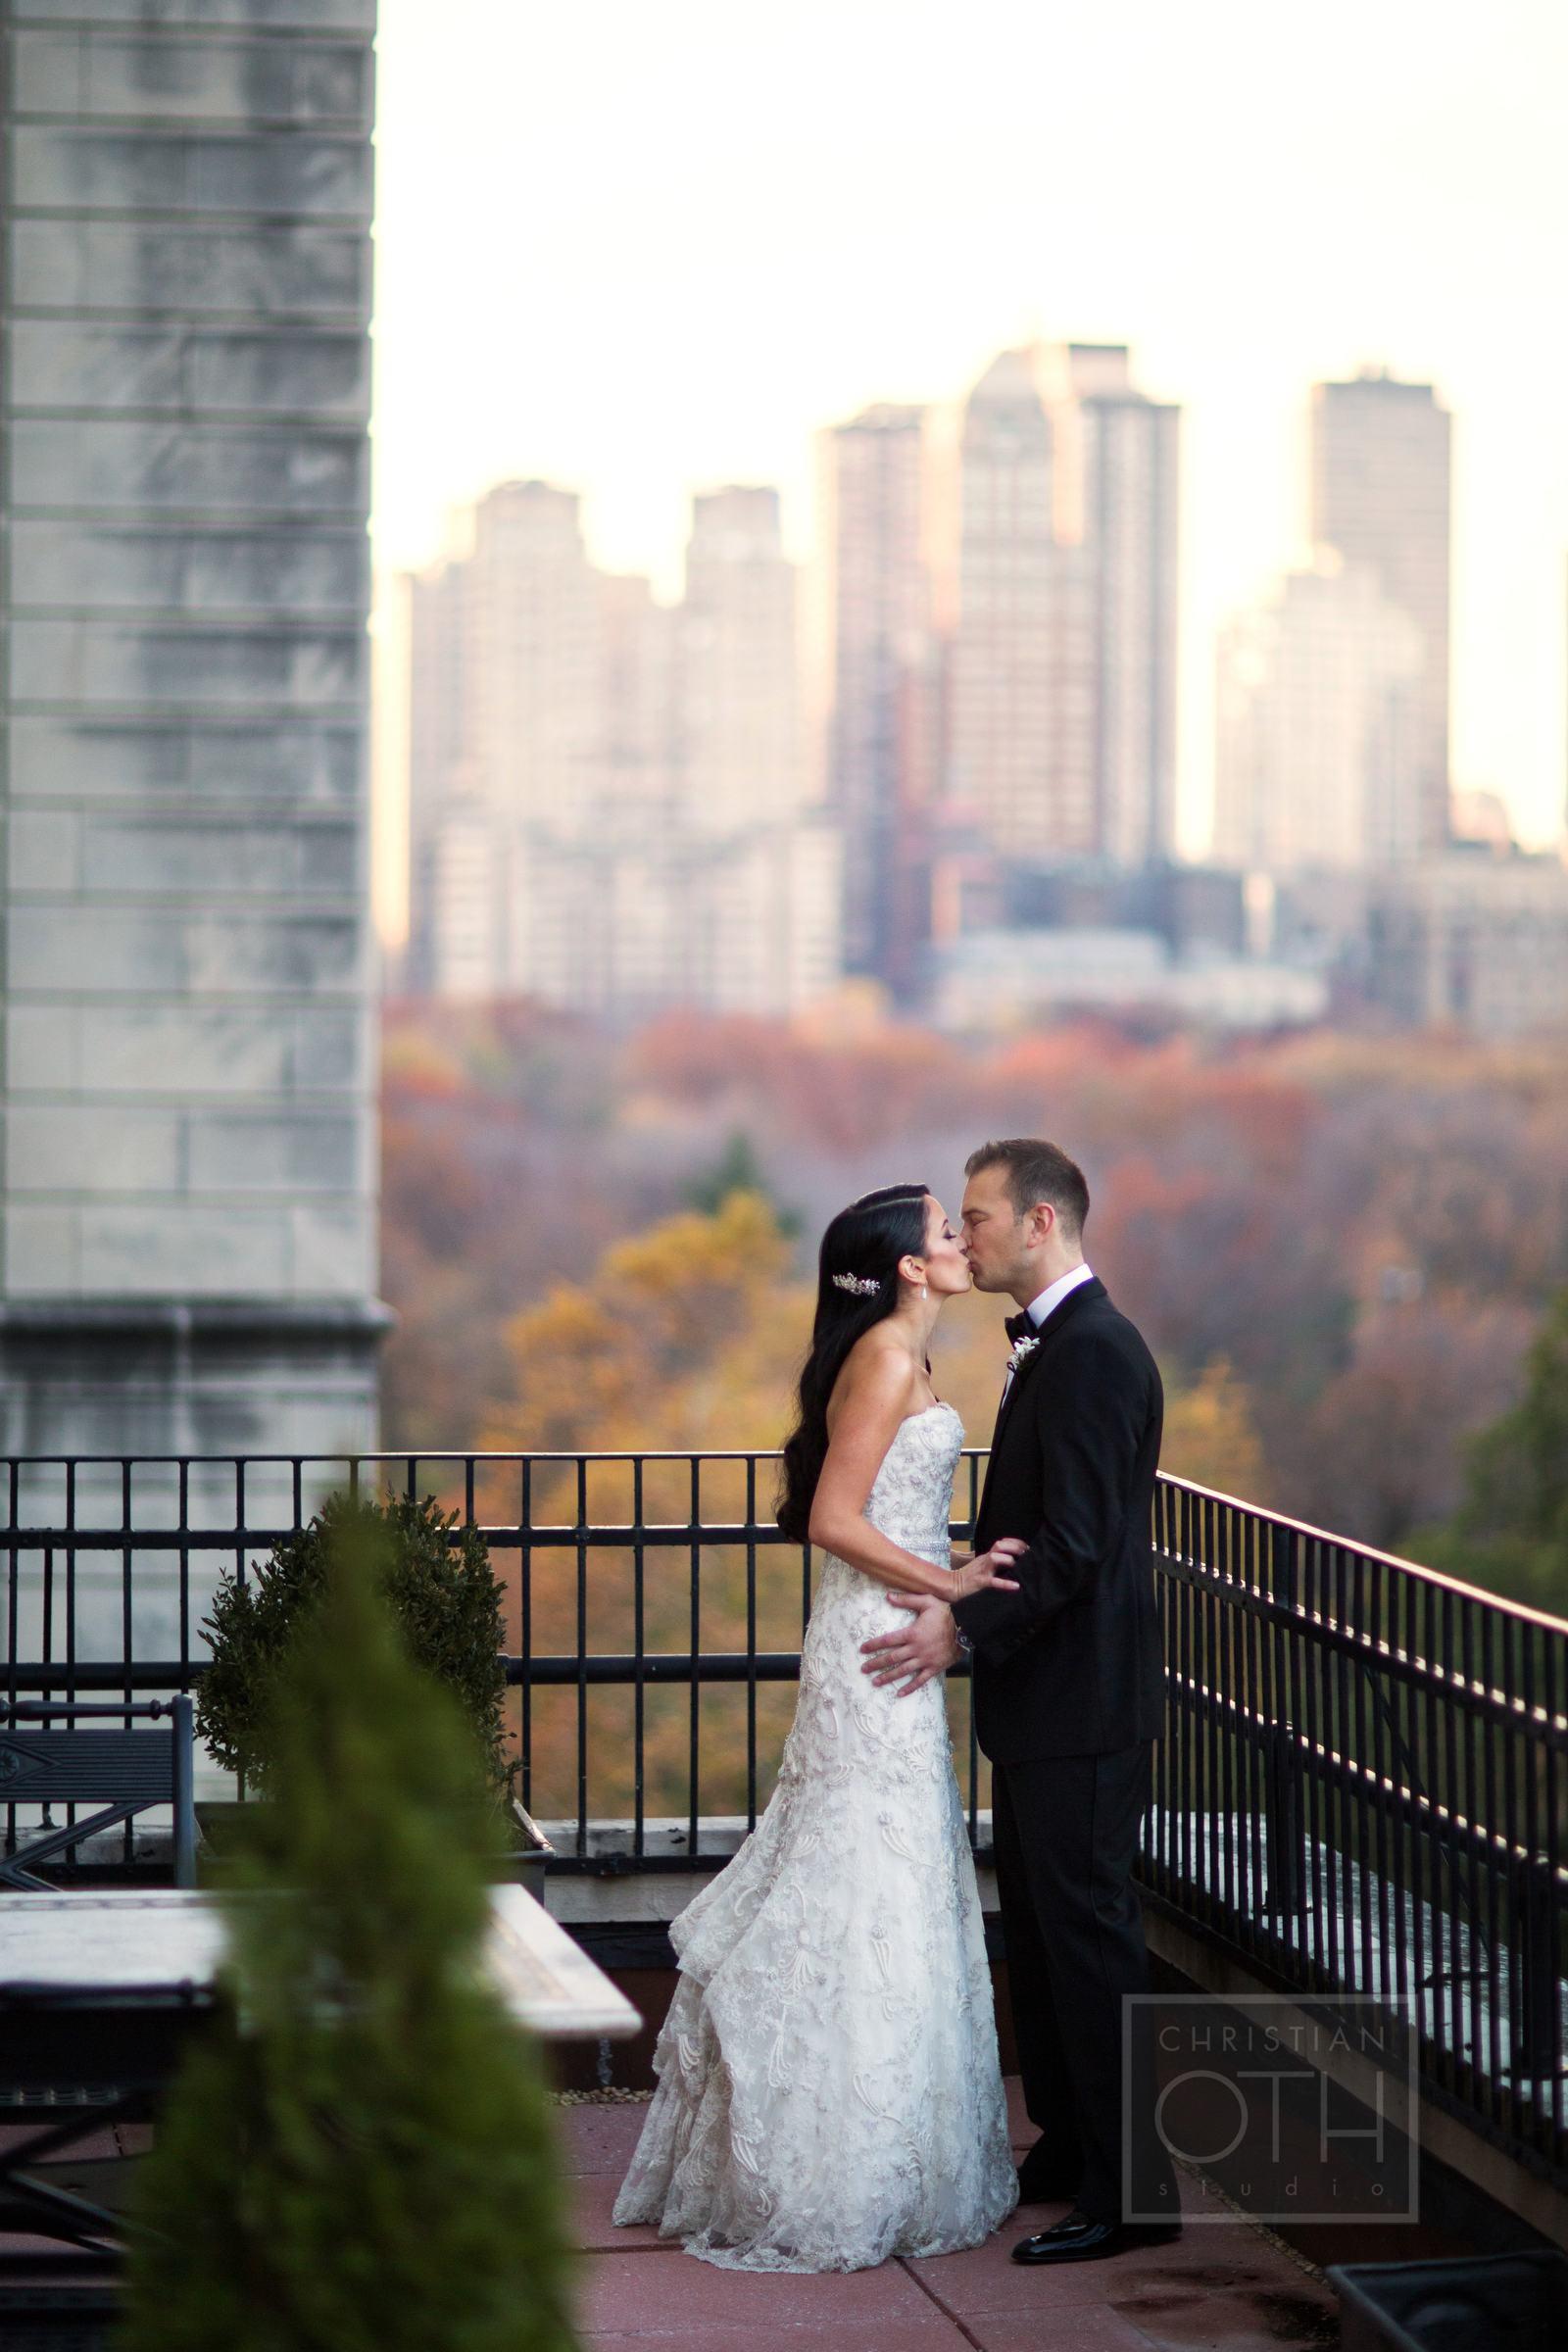 Ceci_New_York_Custom_Invitation_Pierre__City_ Destination_Wedding_Luxury_Personalized_Ceci_Style_Bride_Rose_Gold_Foil_Stamping46.JPG